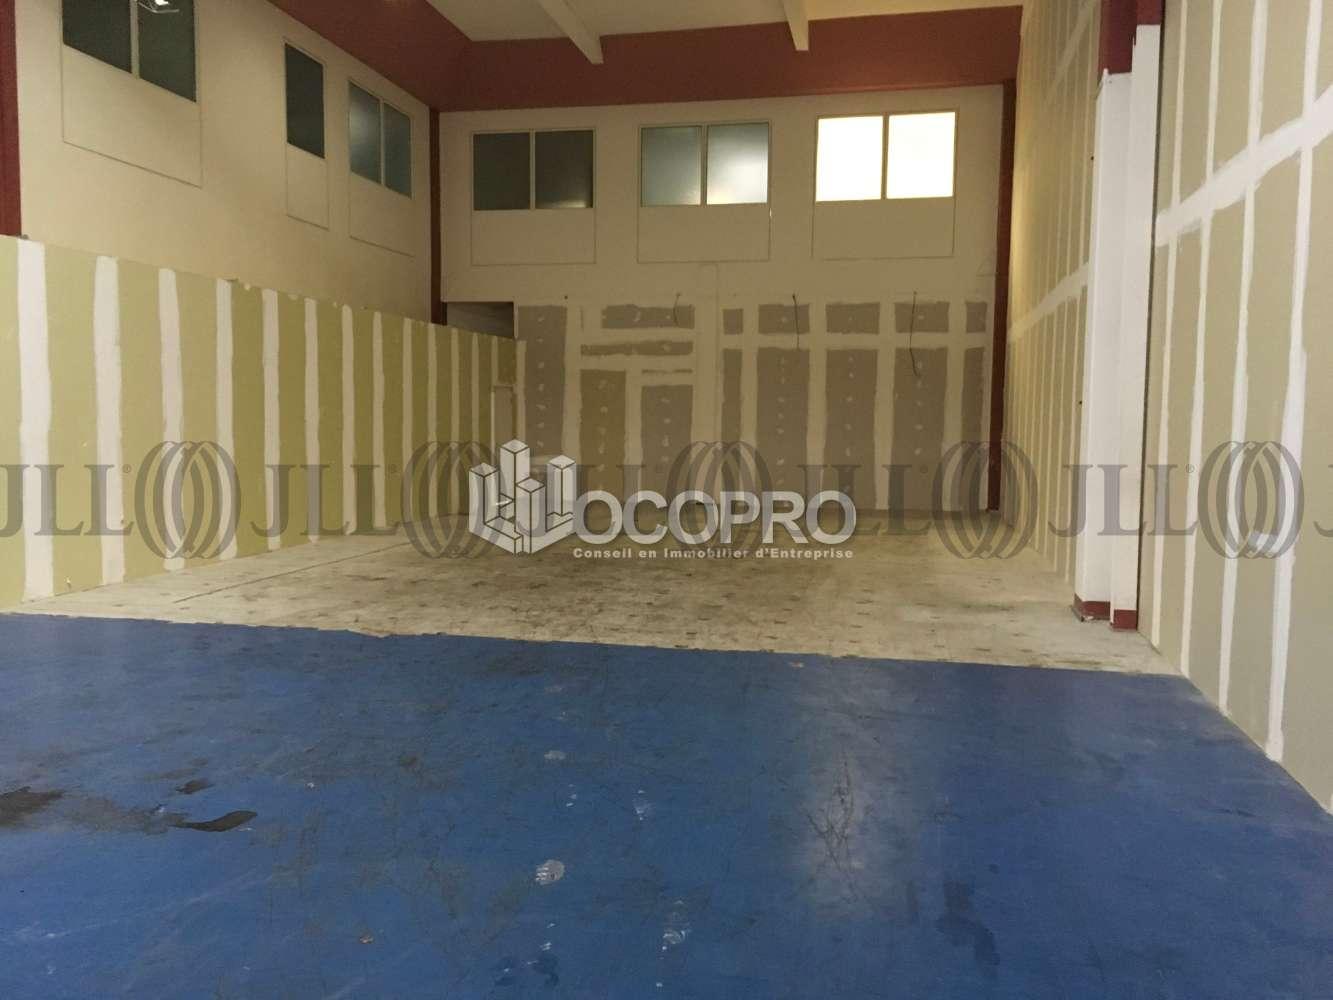 Activités/entrepôt La bocca, 06150